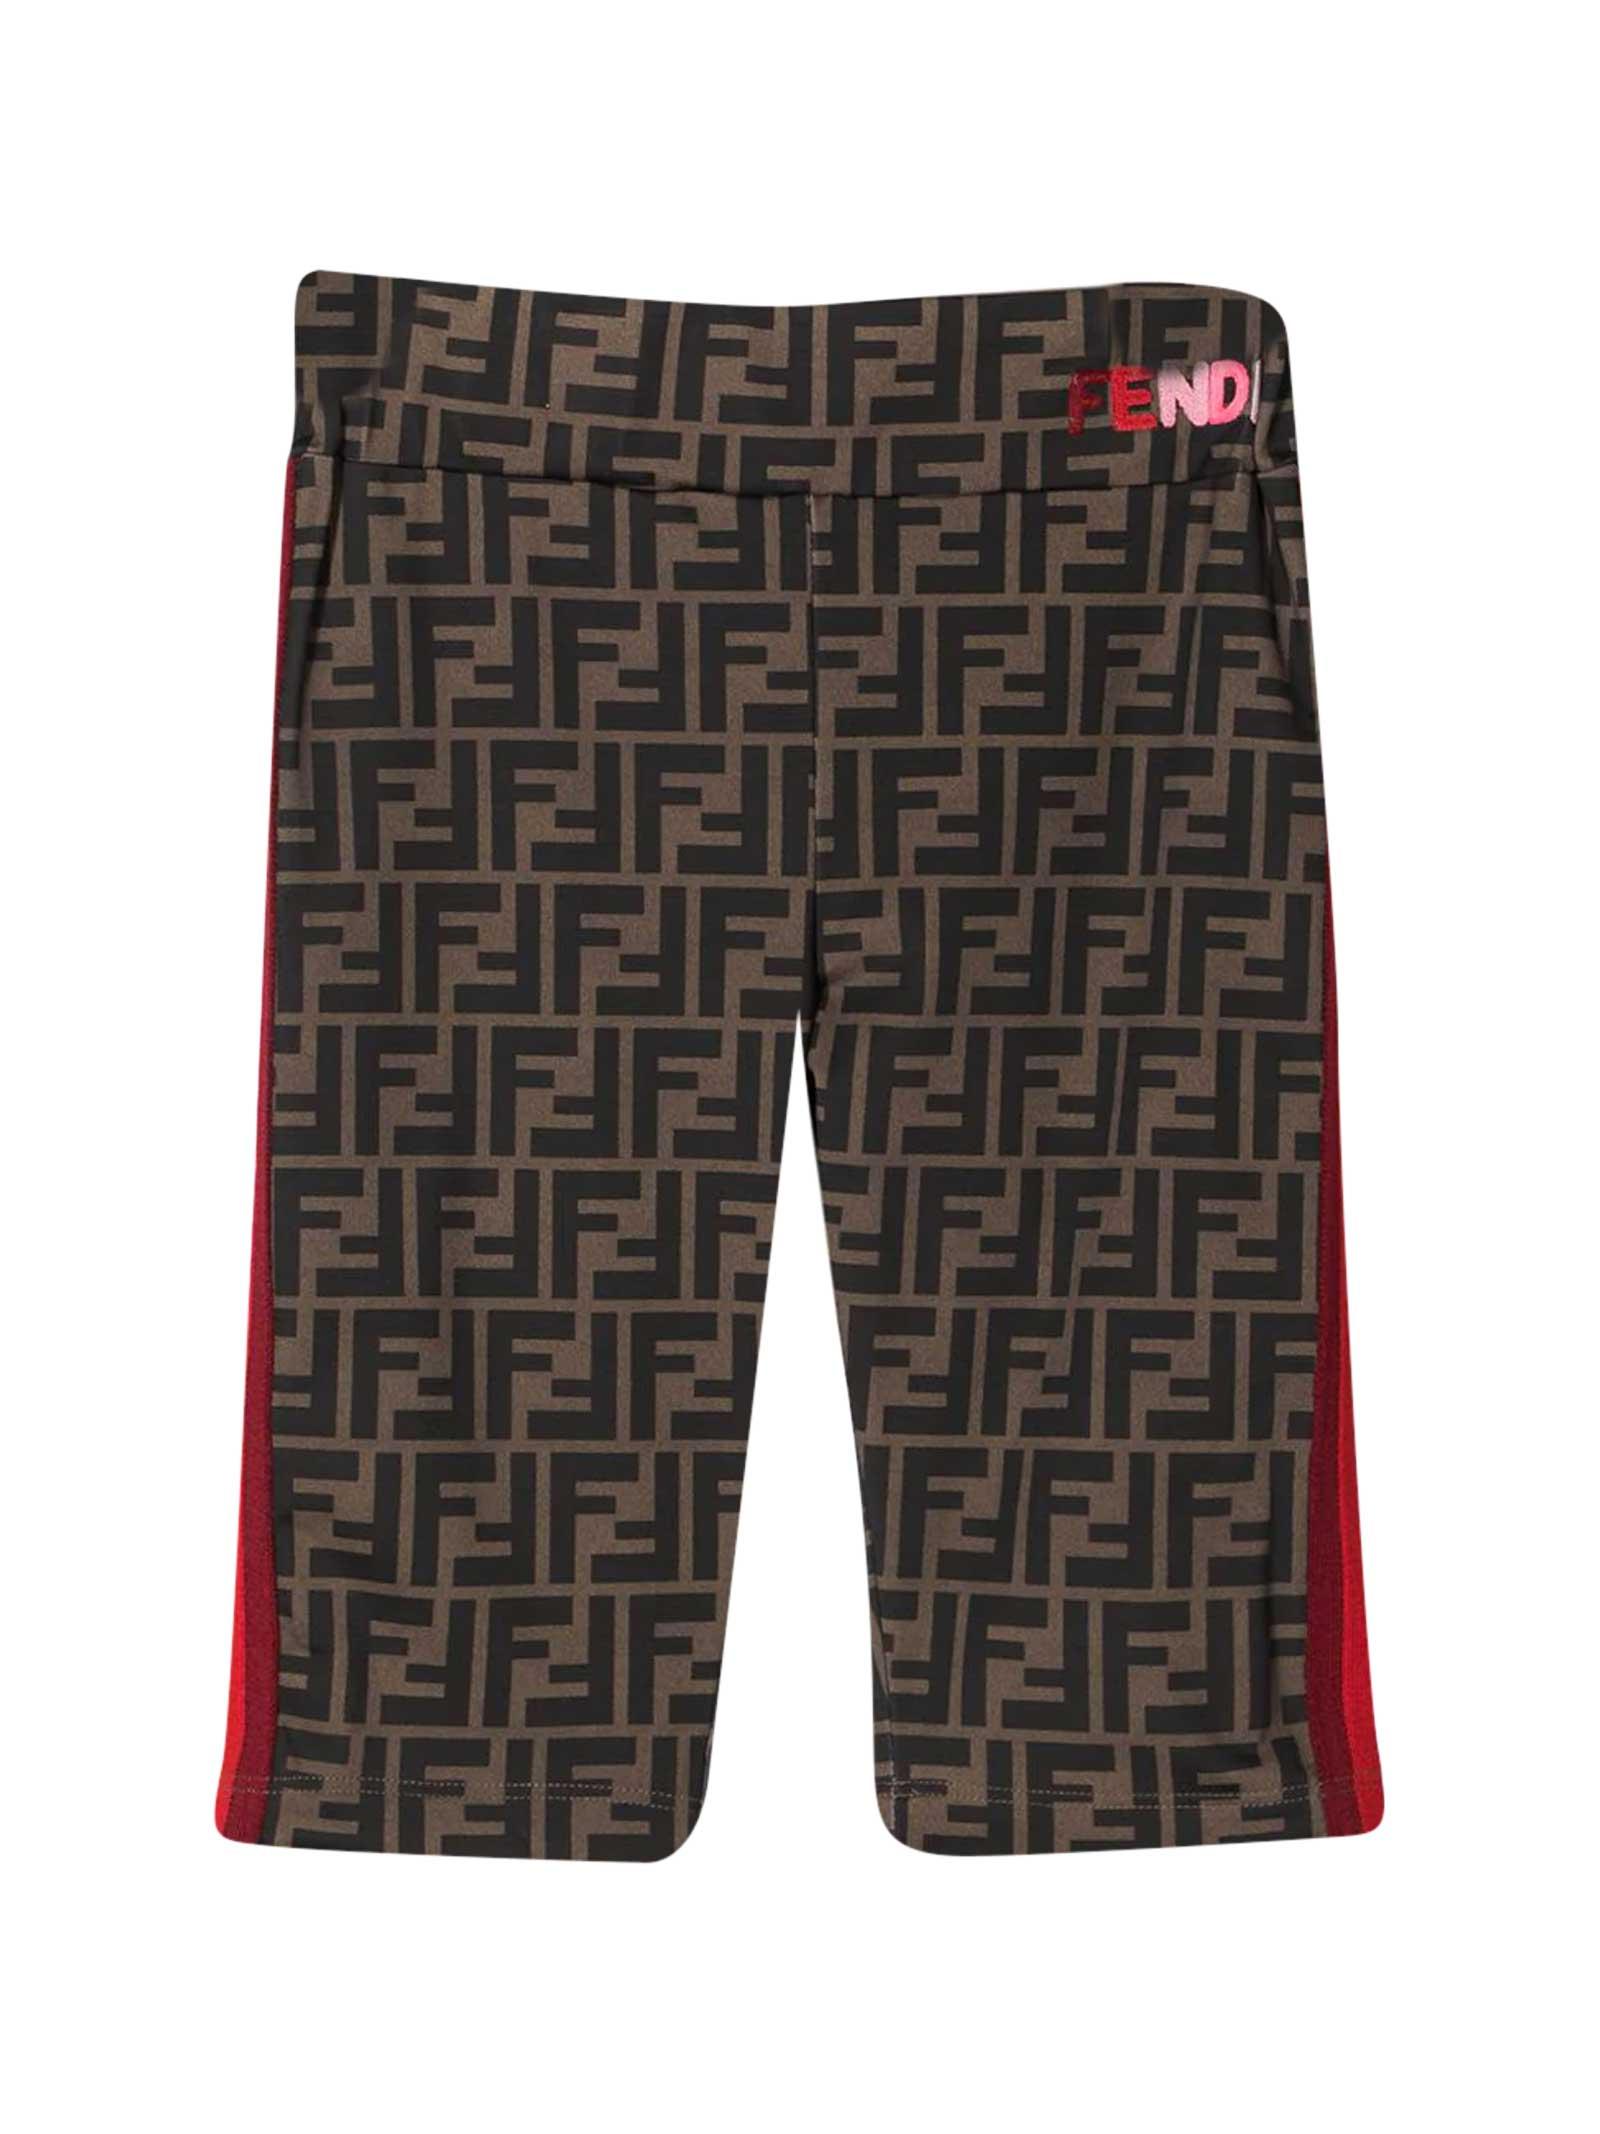 Fendi Zucca Shorts